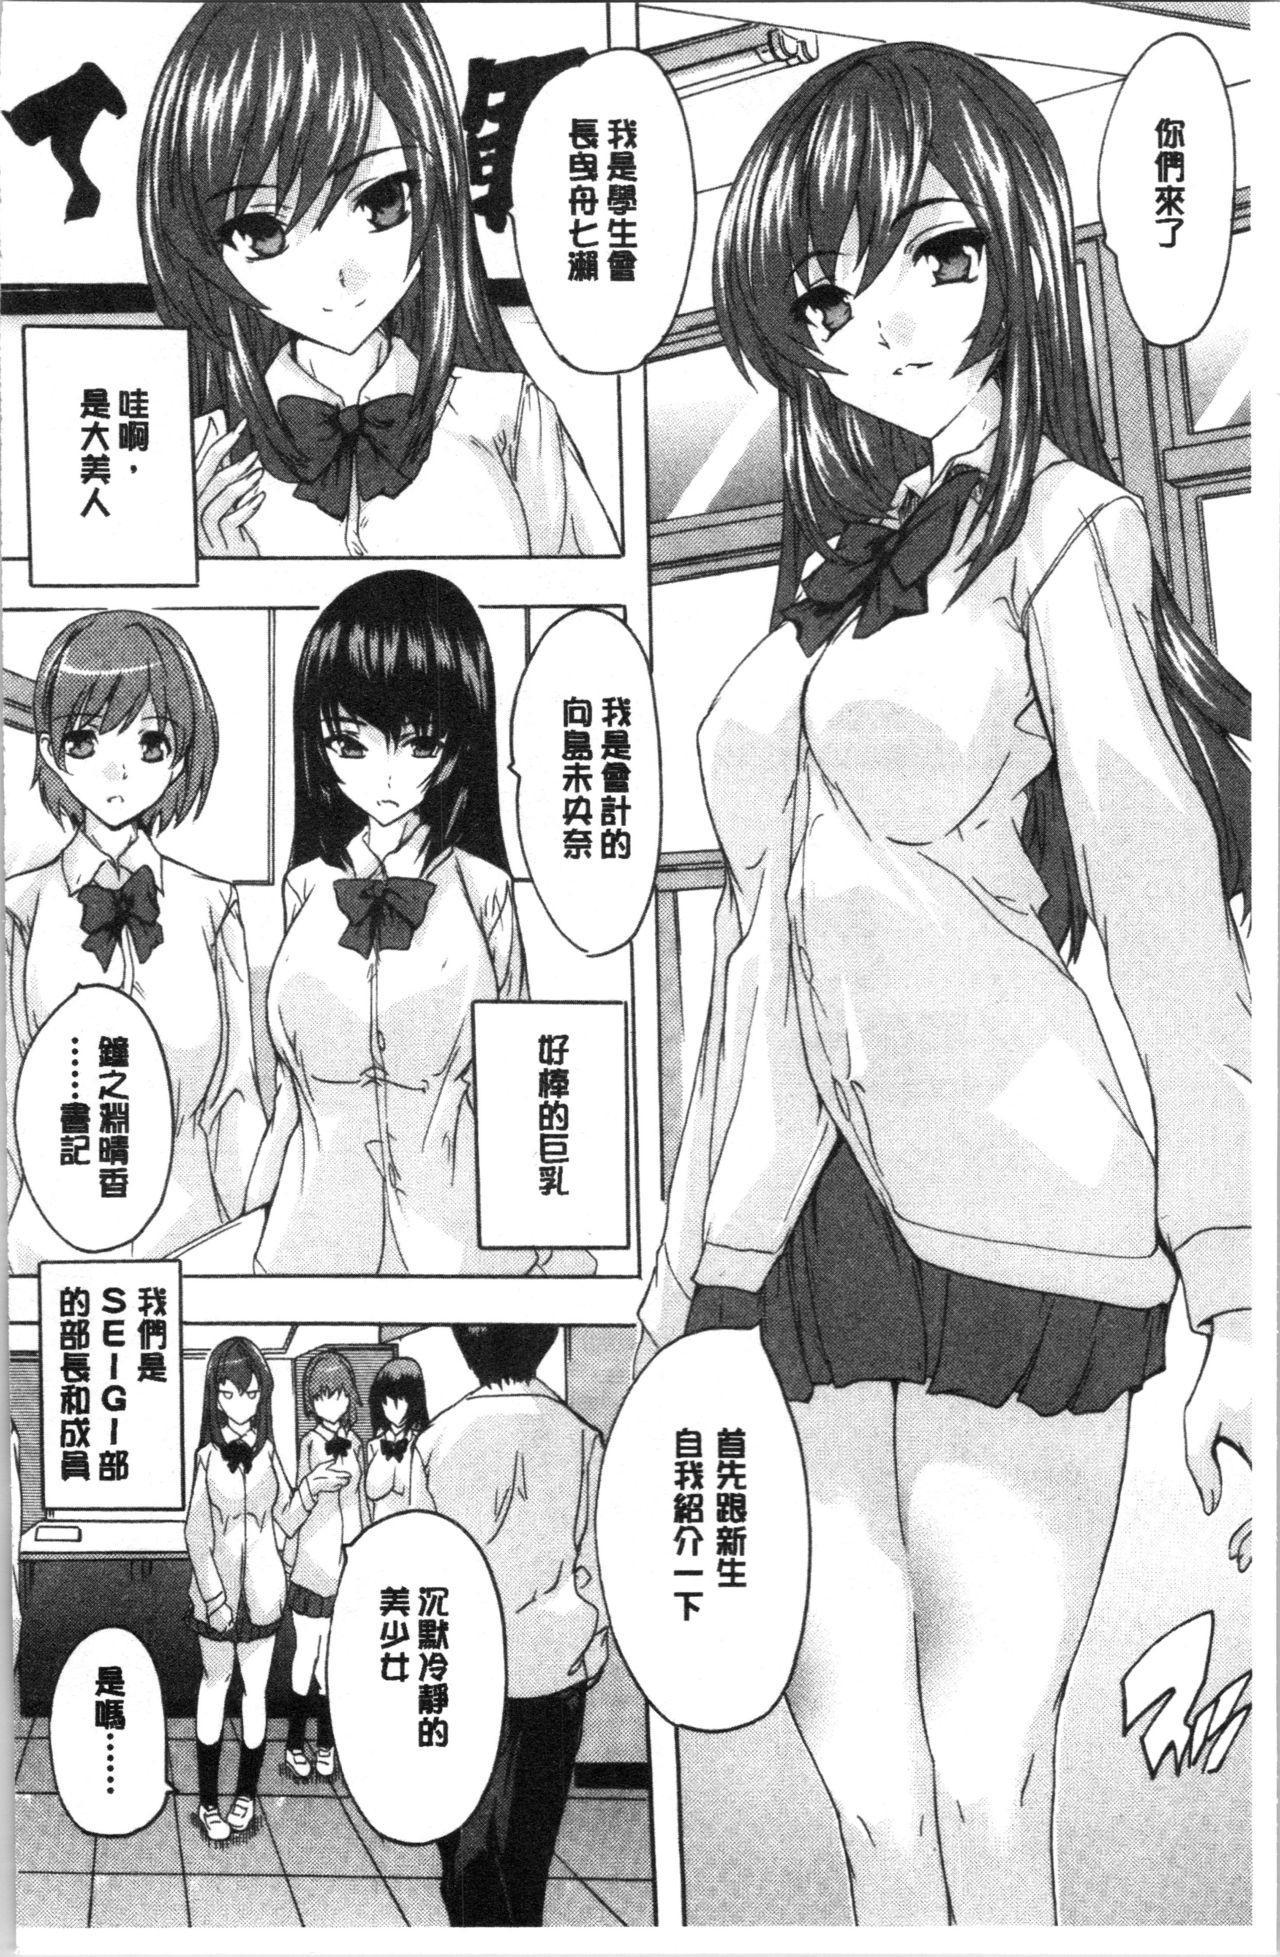 [Natsuka Q-Ya] Hisshuu!! Sex-bu - SEIGI-DO The Ultimate Martial Arts   必修!!性愛淫交部 [Chinese] 6